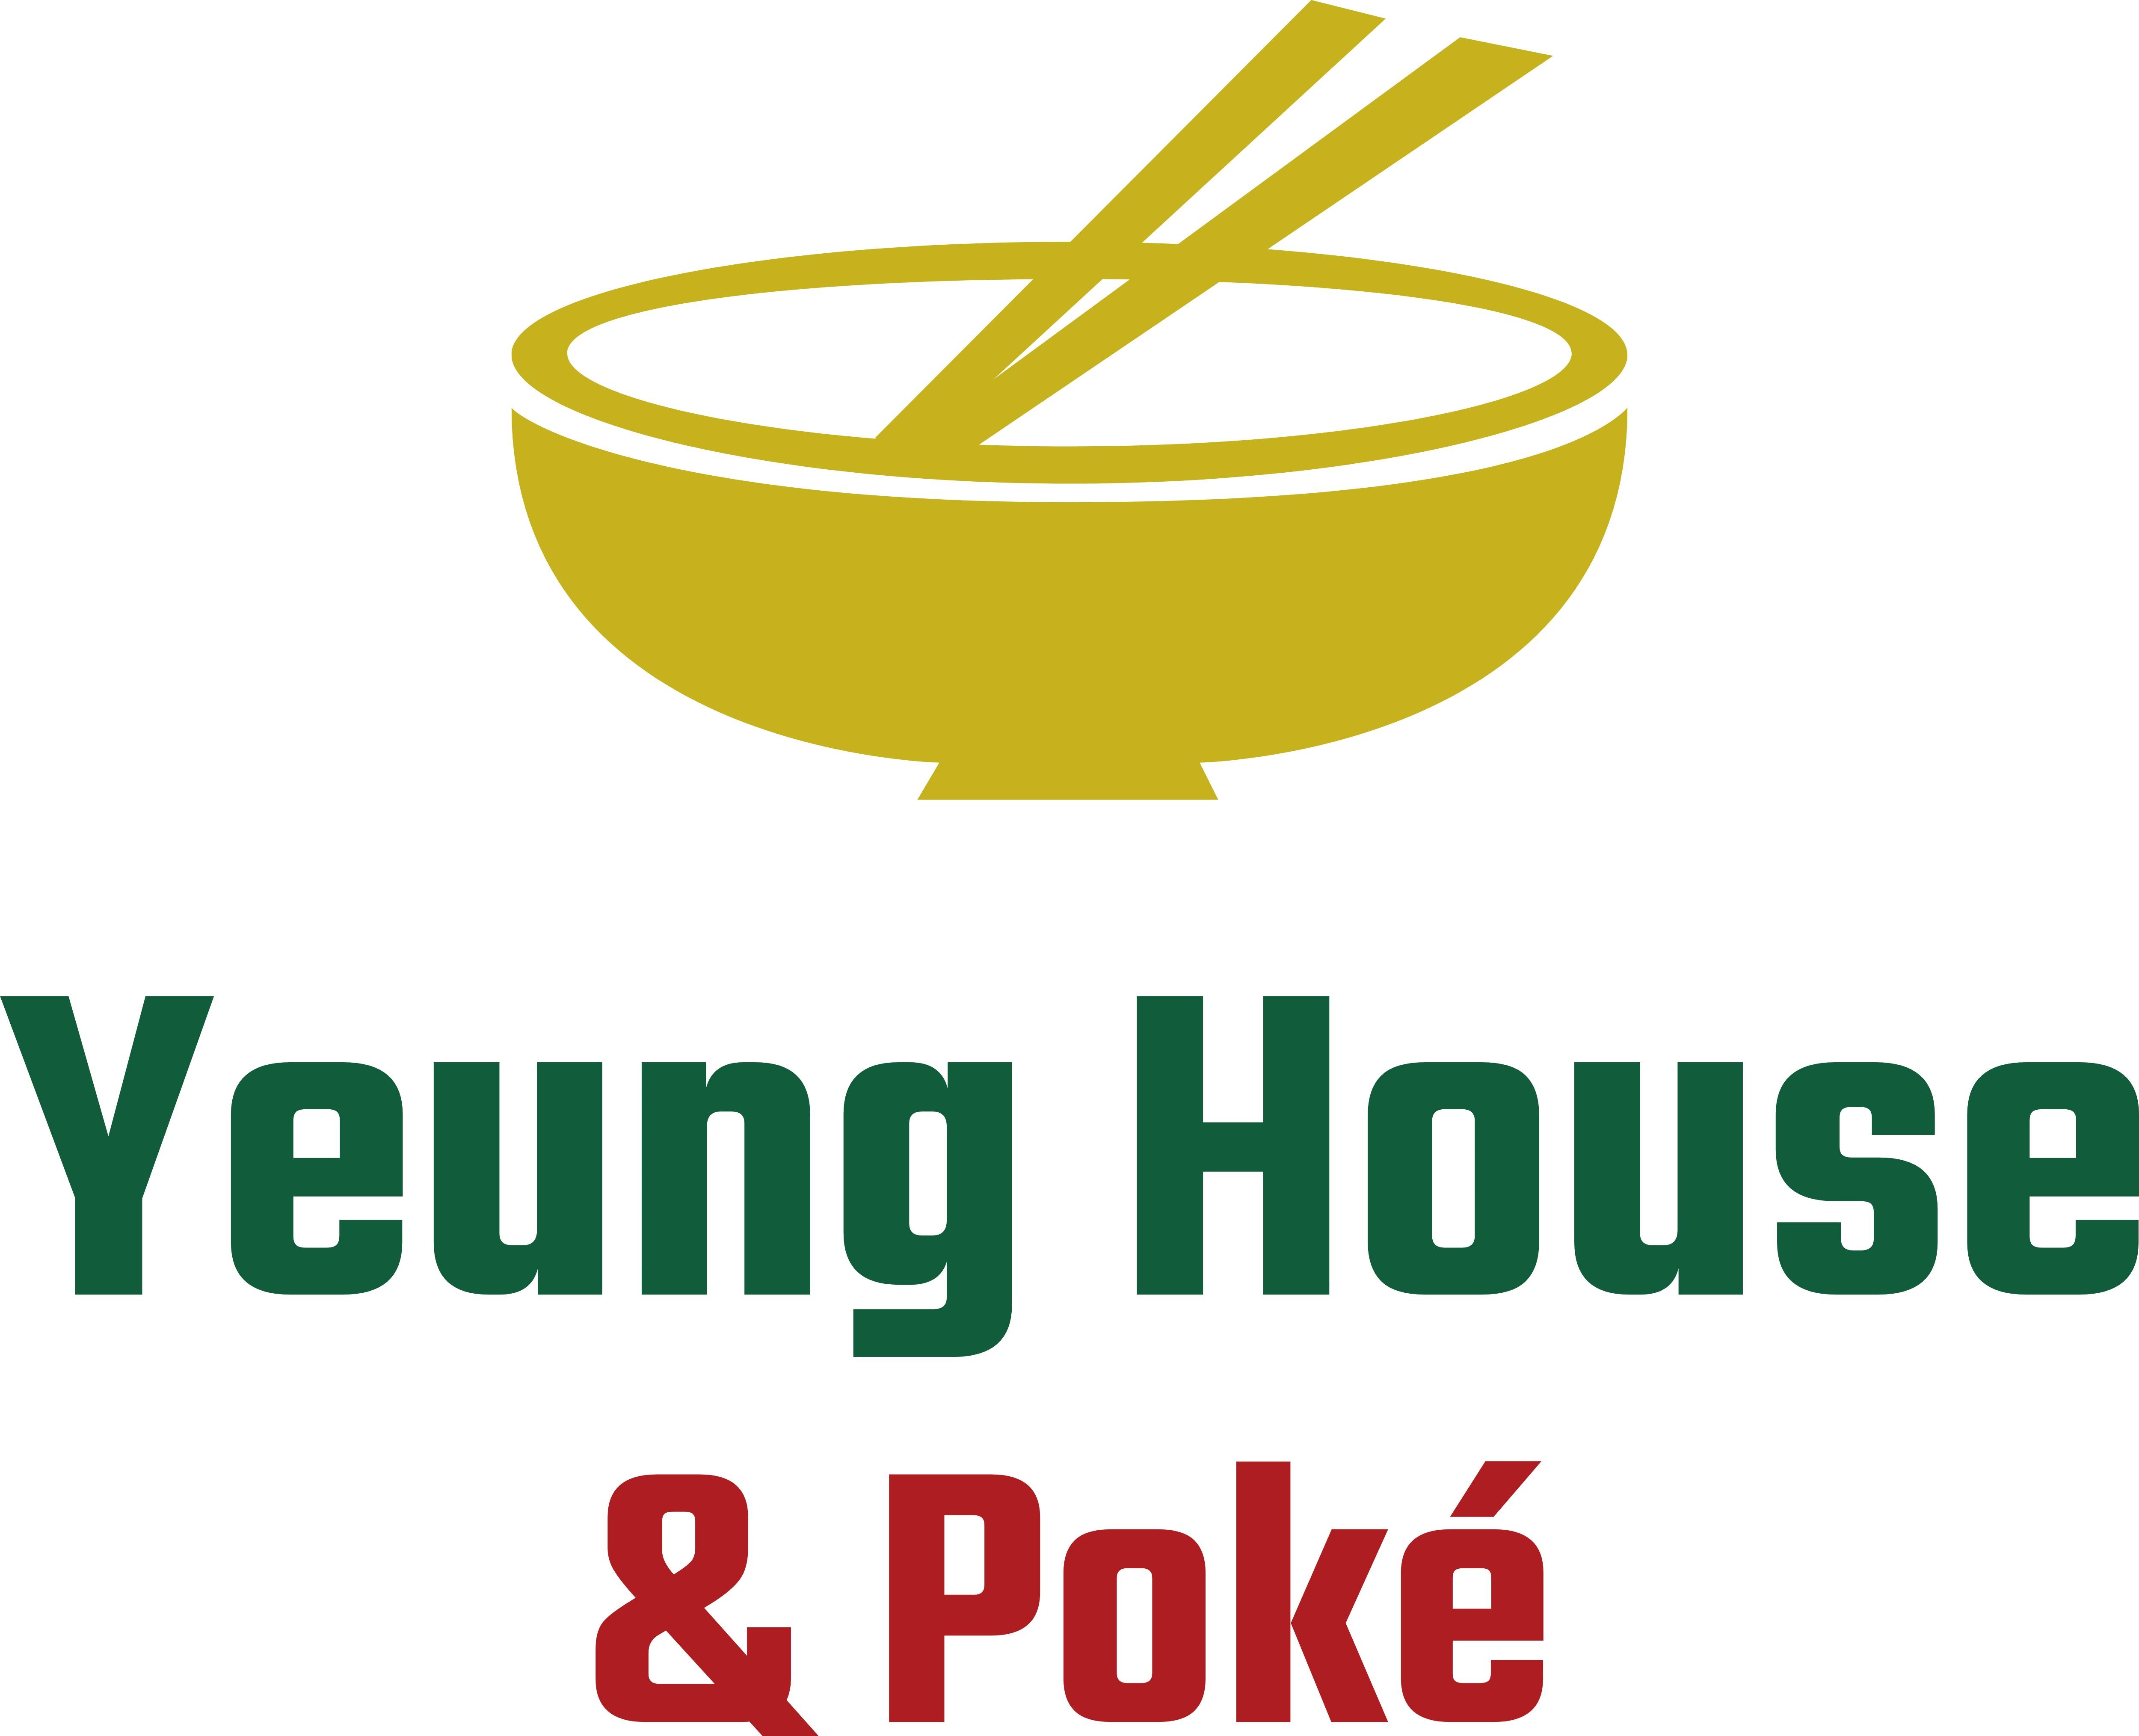 Yeung House & Poke